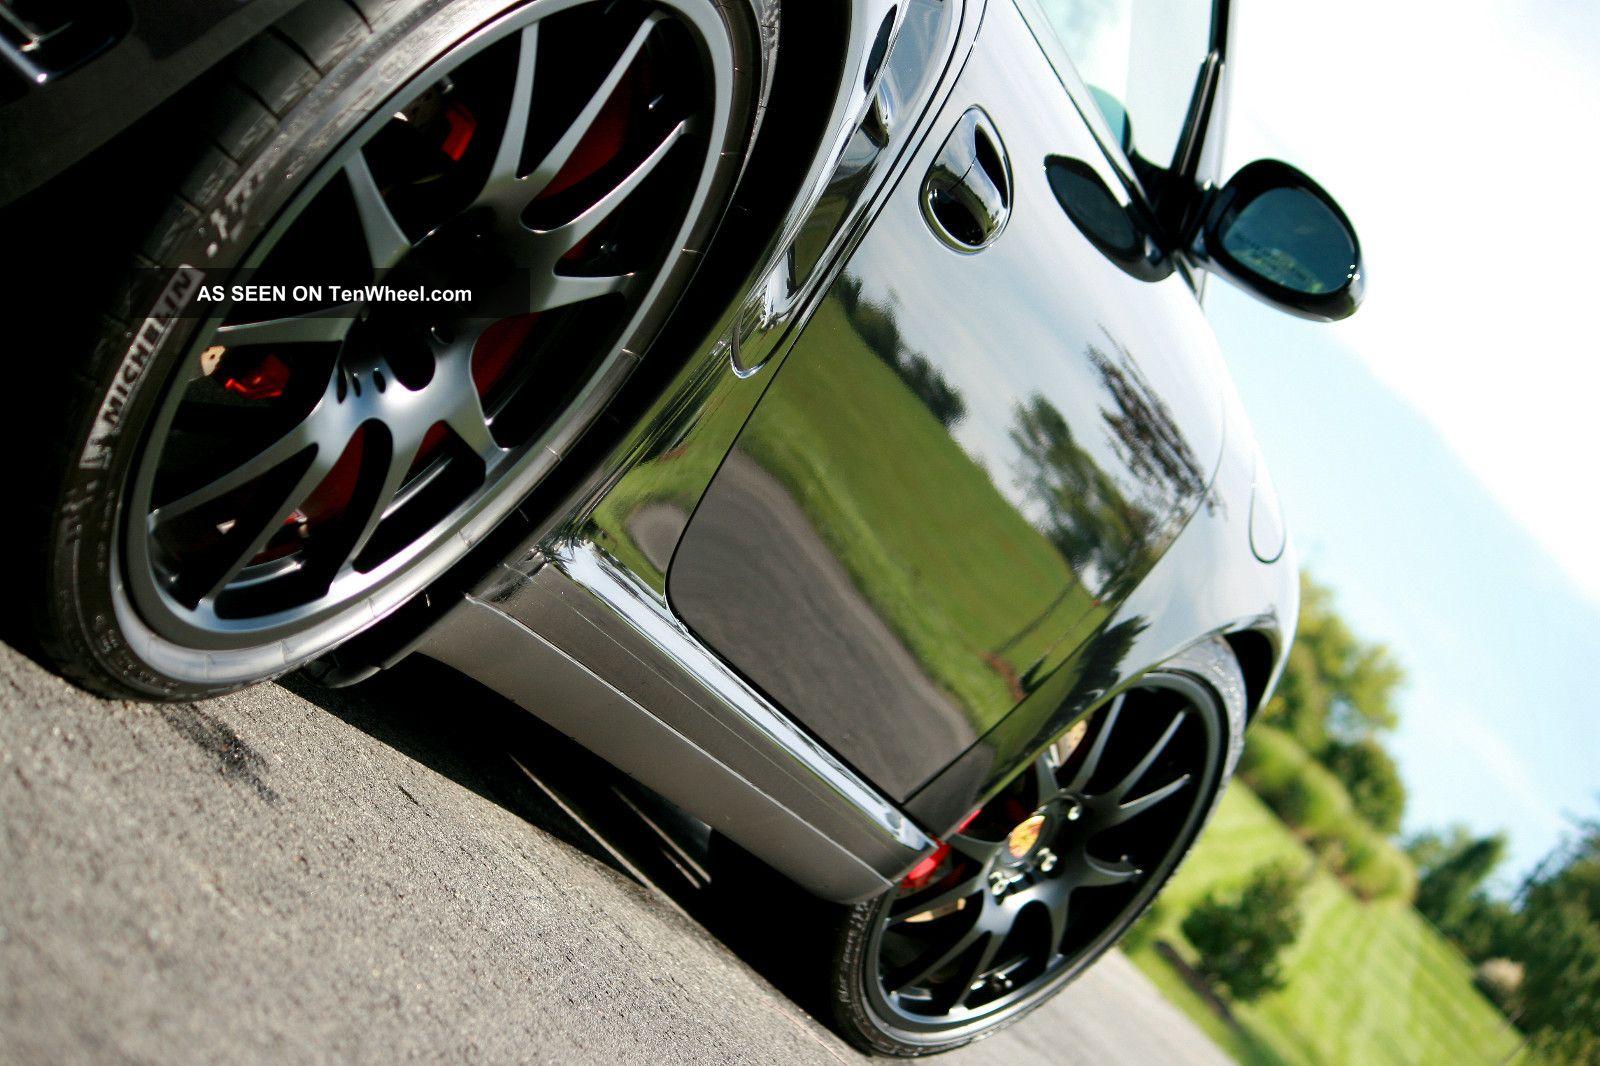 2008 Turbo Cabriolet Metallic Blk Carrera Gt Interior 1owner Low Mls Upgrades 911 photo